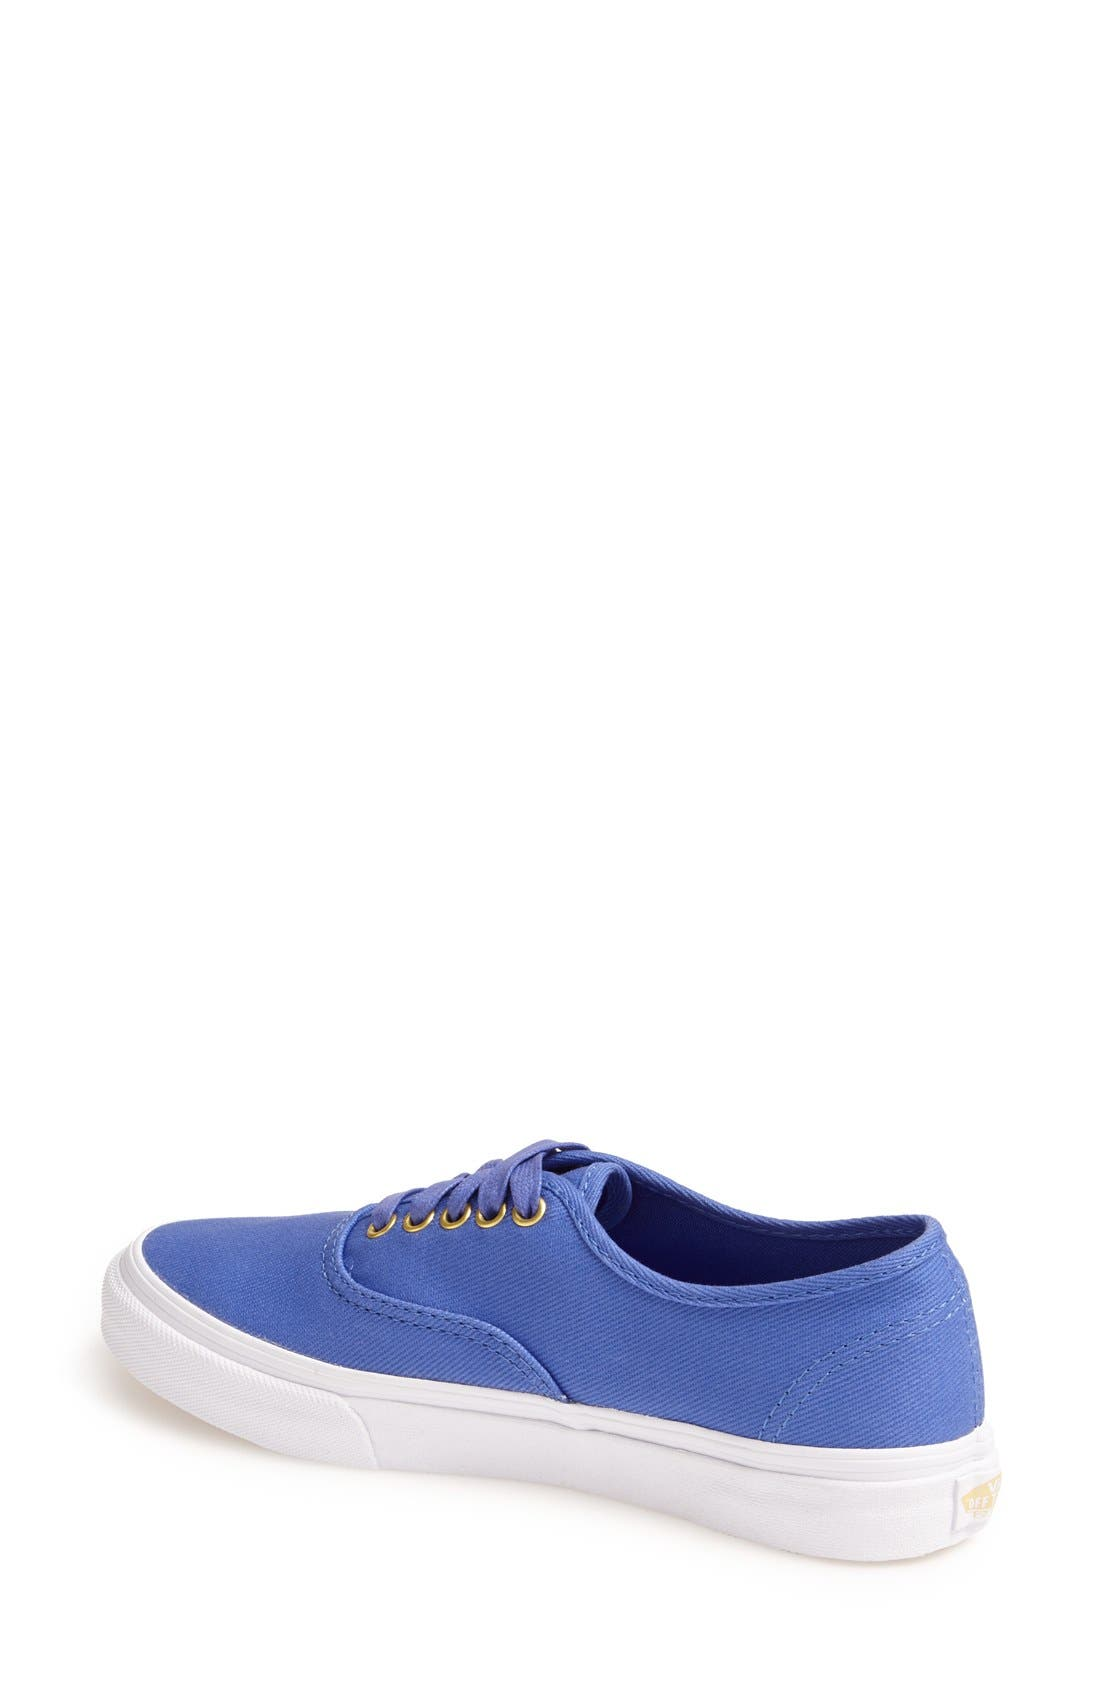 Alternate Image 2  - Vans 'Authentic Slim' Twill Sneaker (Women)